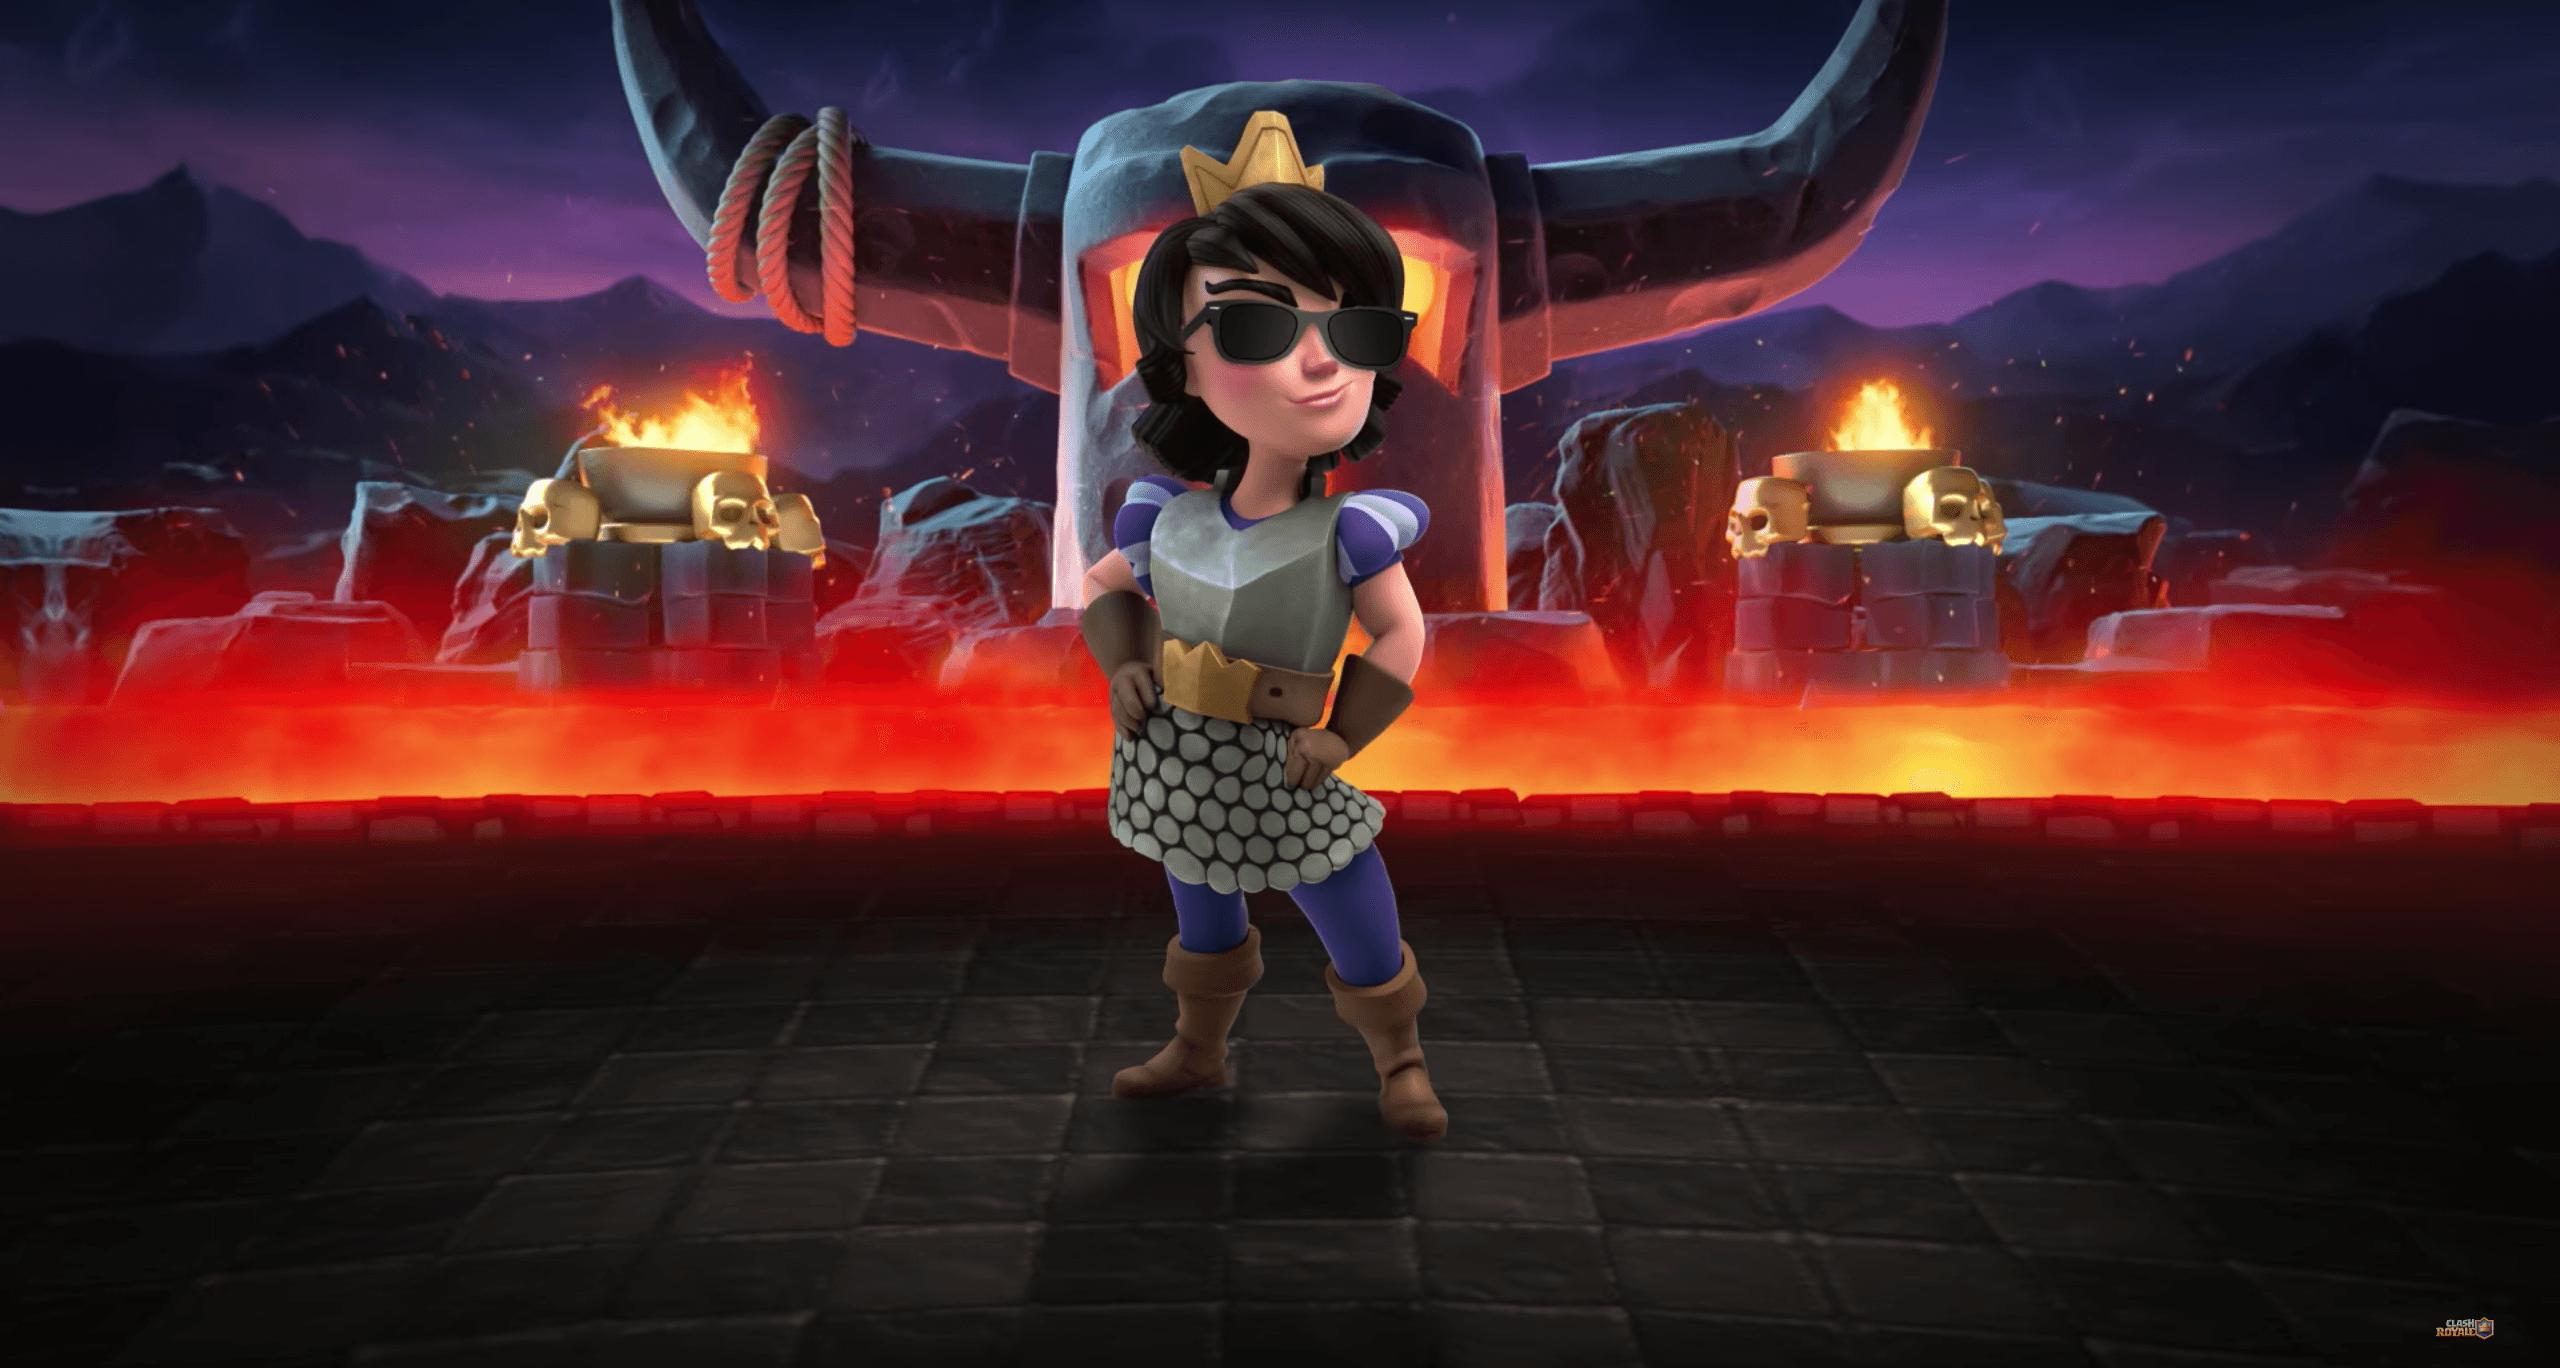 Clash Royale Wallpaper Princess - Princess From Clash Royale , HD Wallpaper & Backgrounds